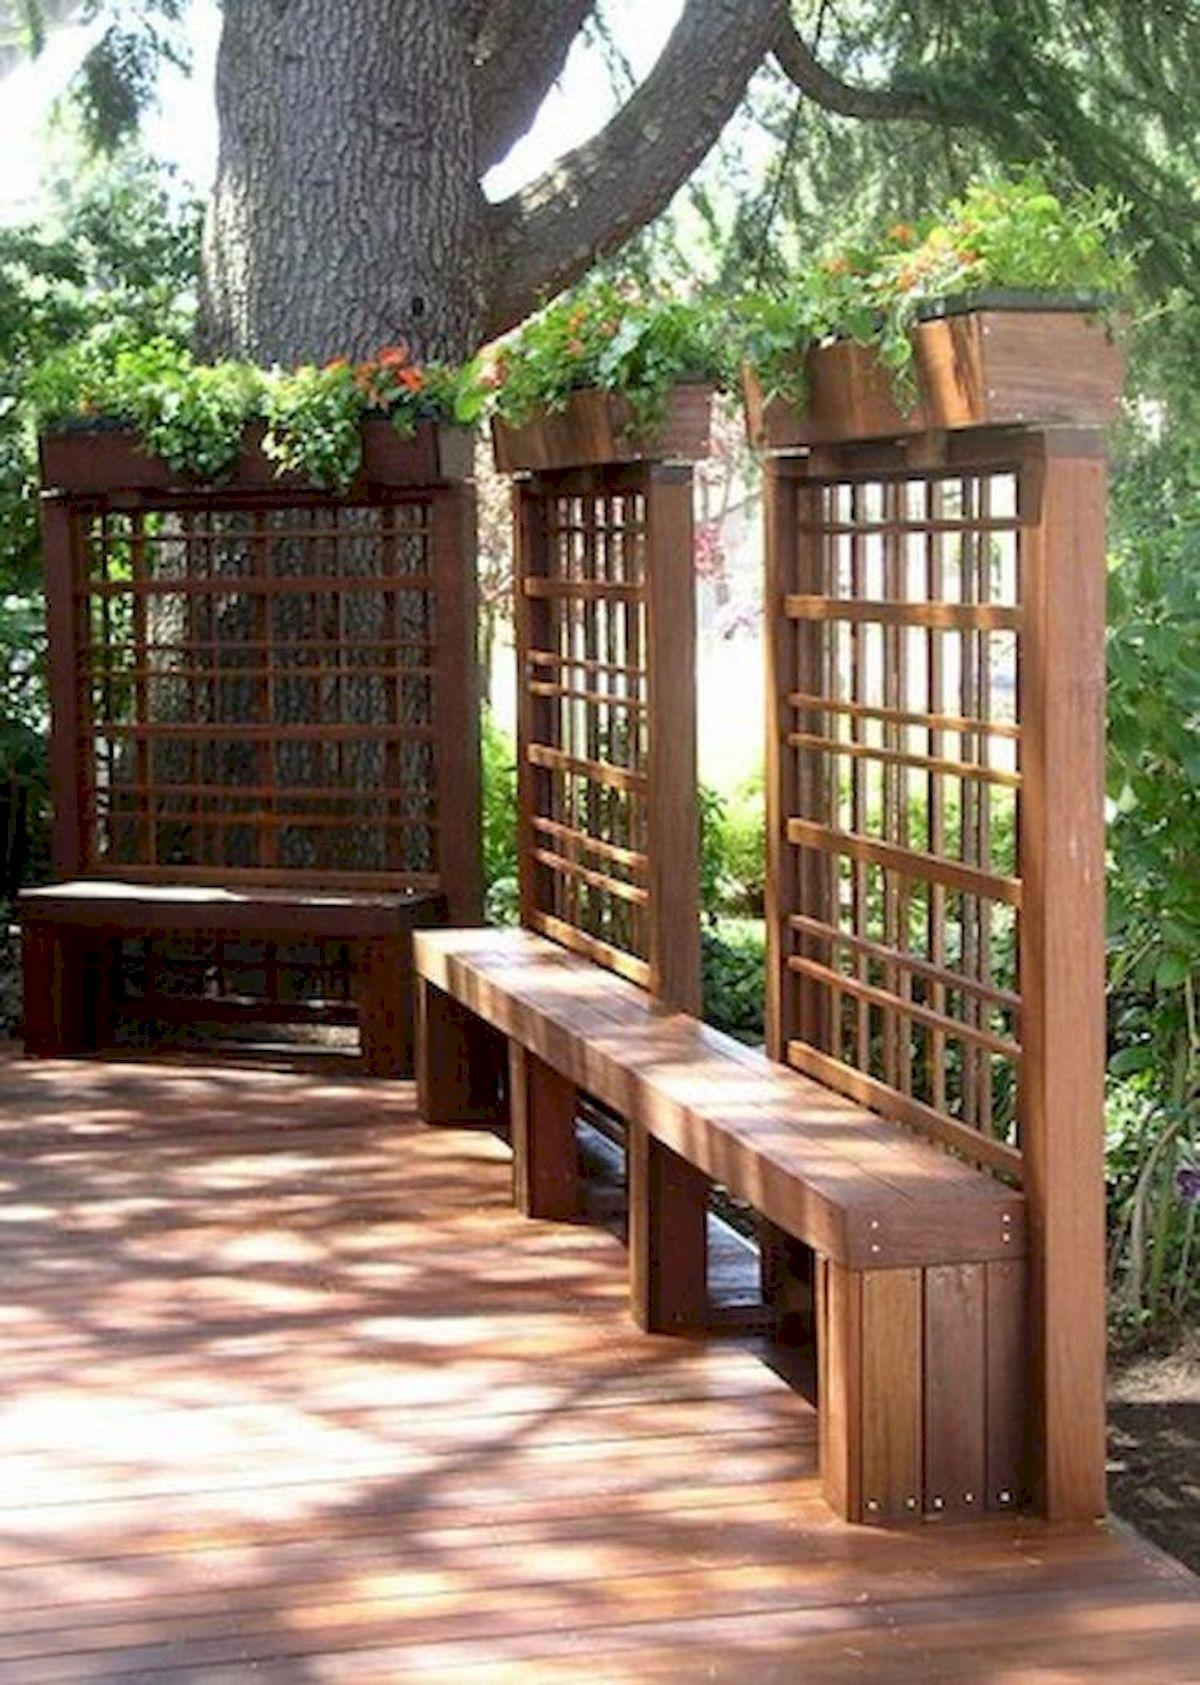 60 Awesome DIY Backyard Privacy Design And Decor Ideas (10)